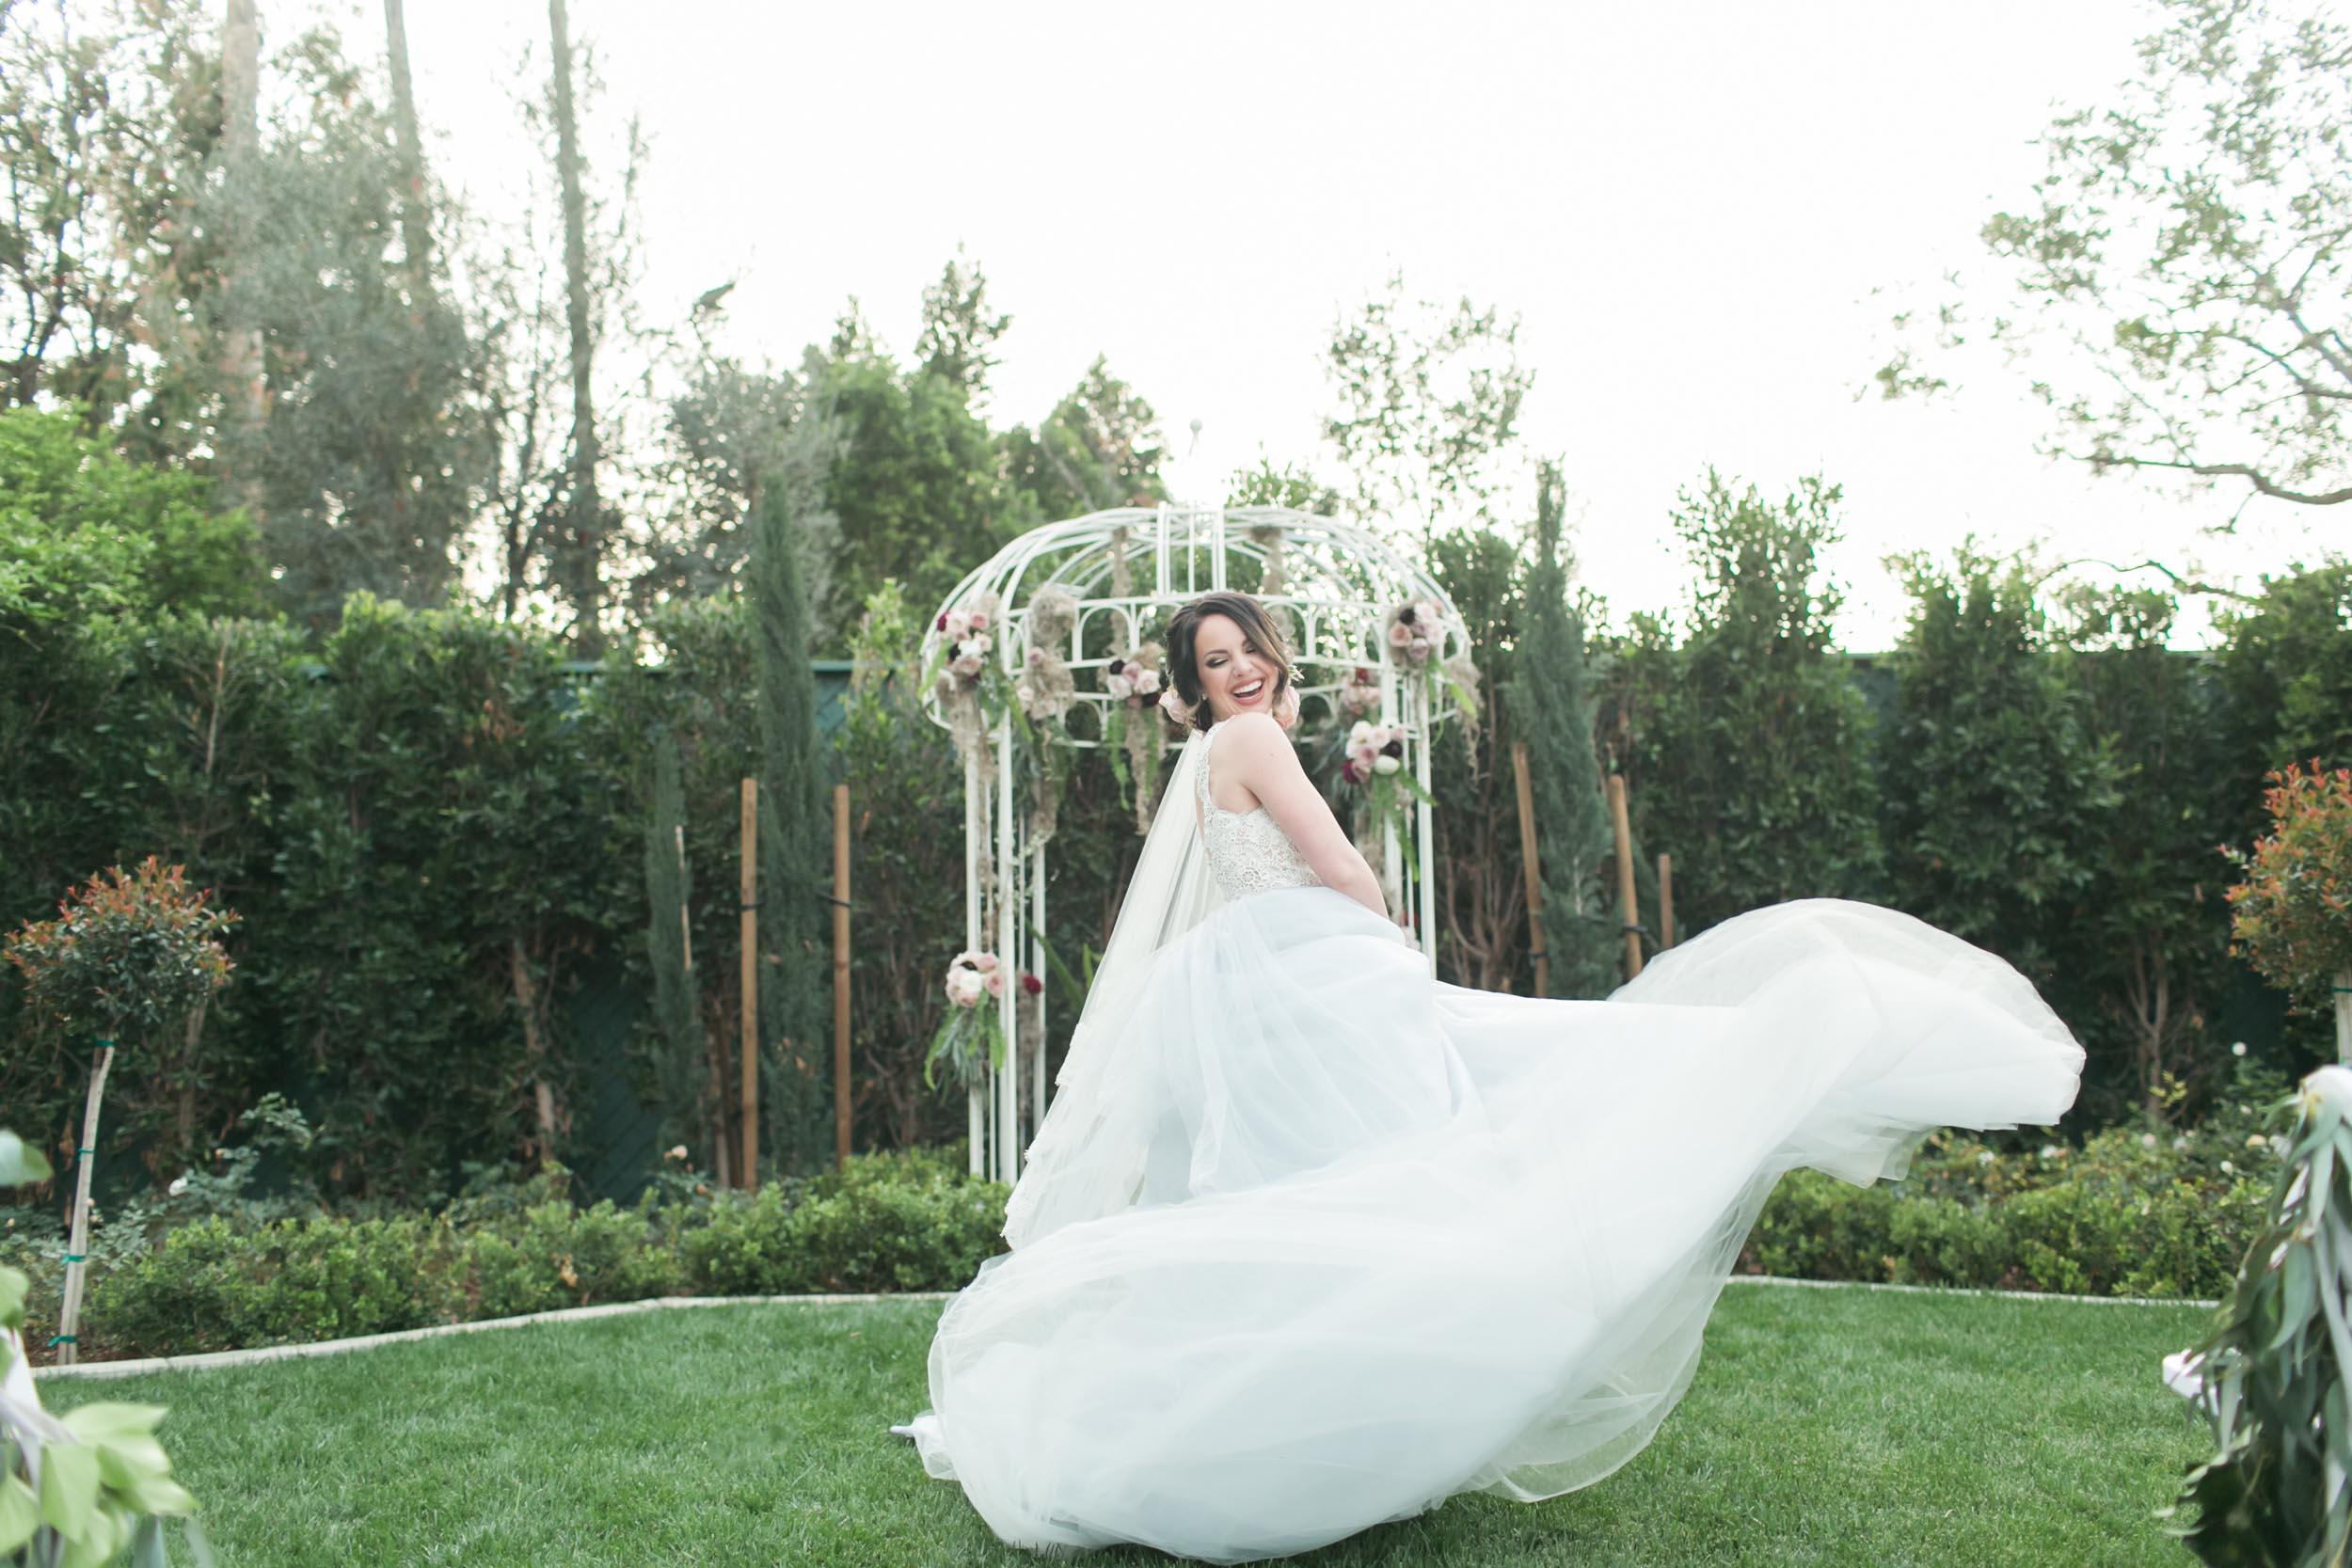 christmas-house-wedding-venue-white-garden-bridal-portraits-carrie-vines-129.jpg